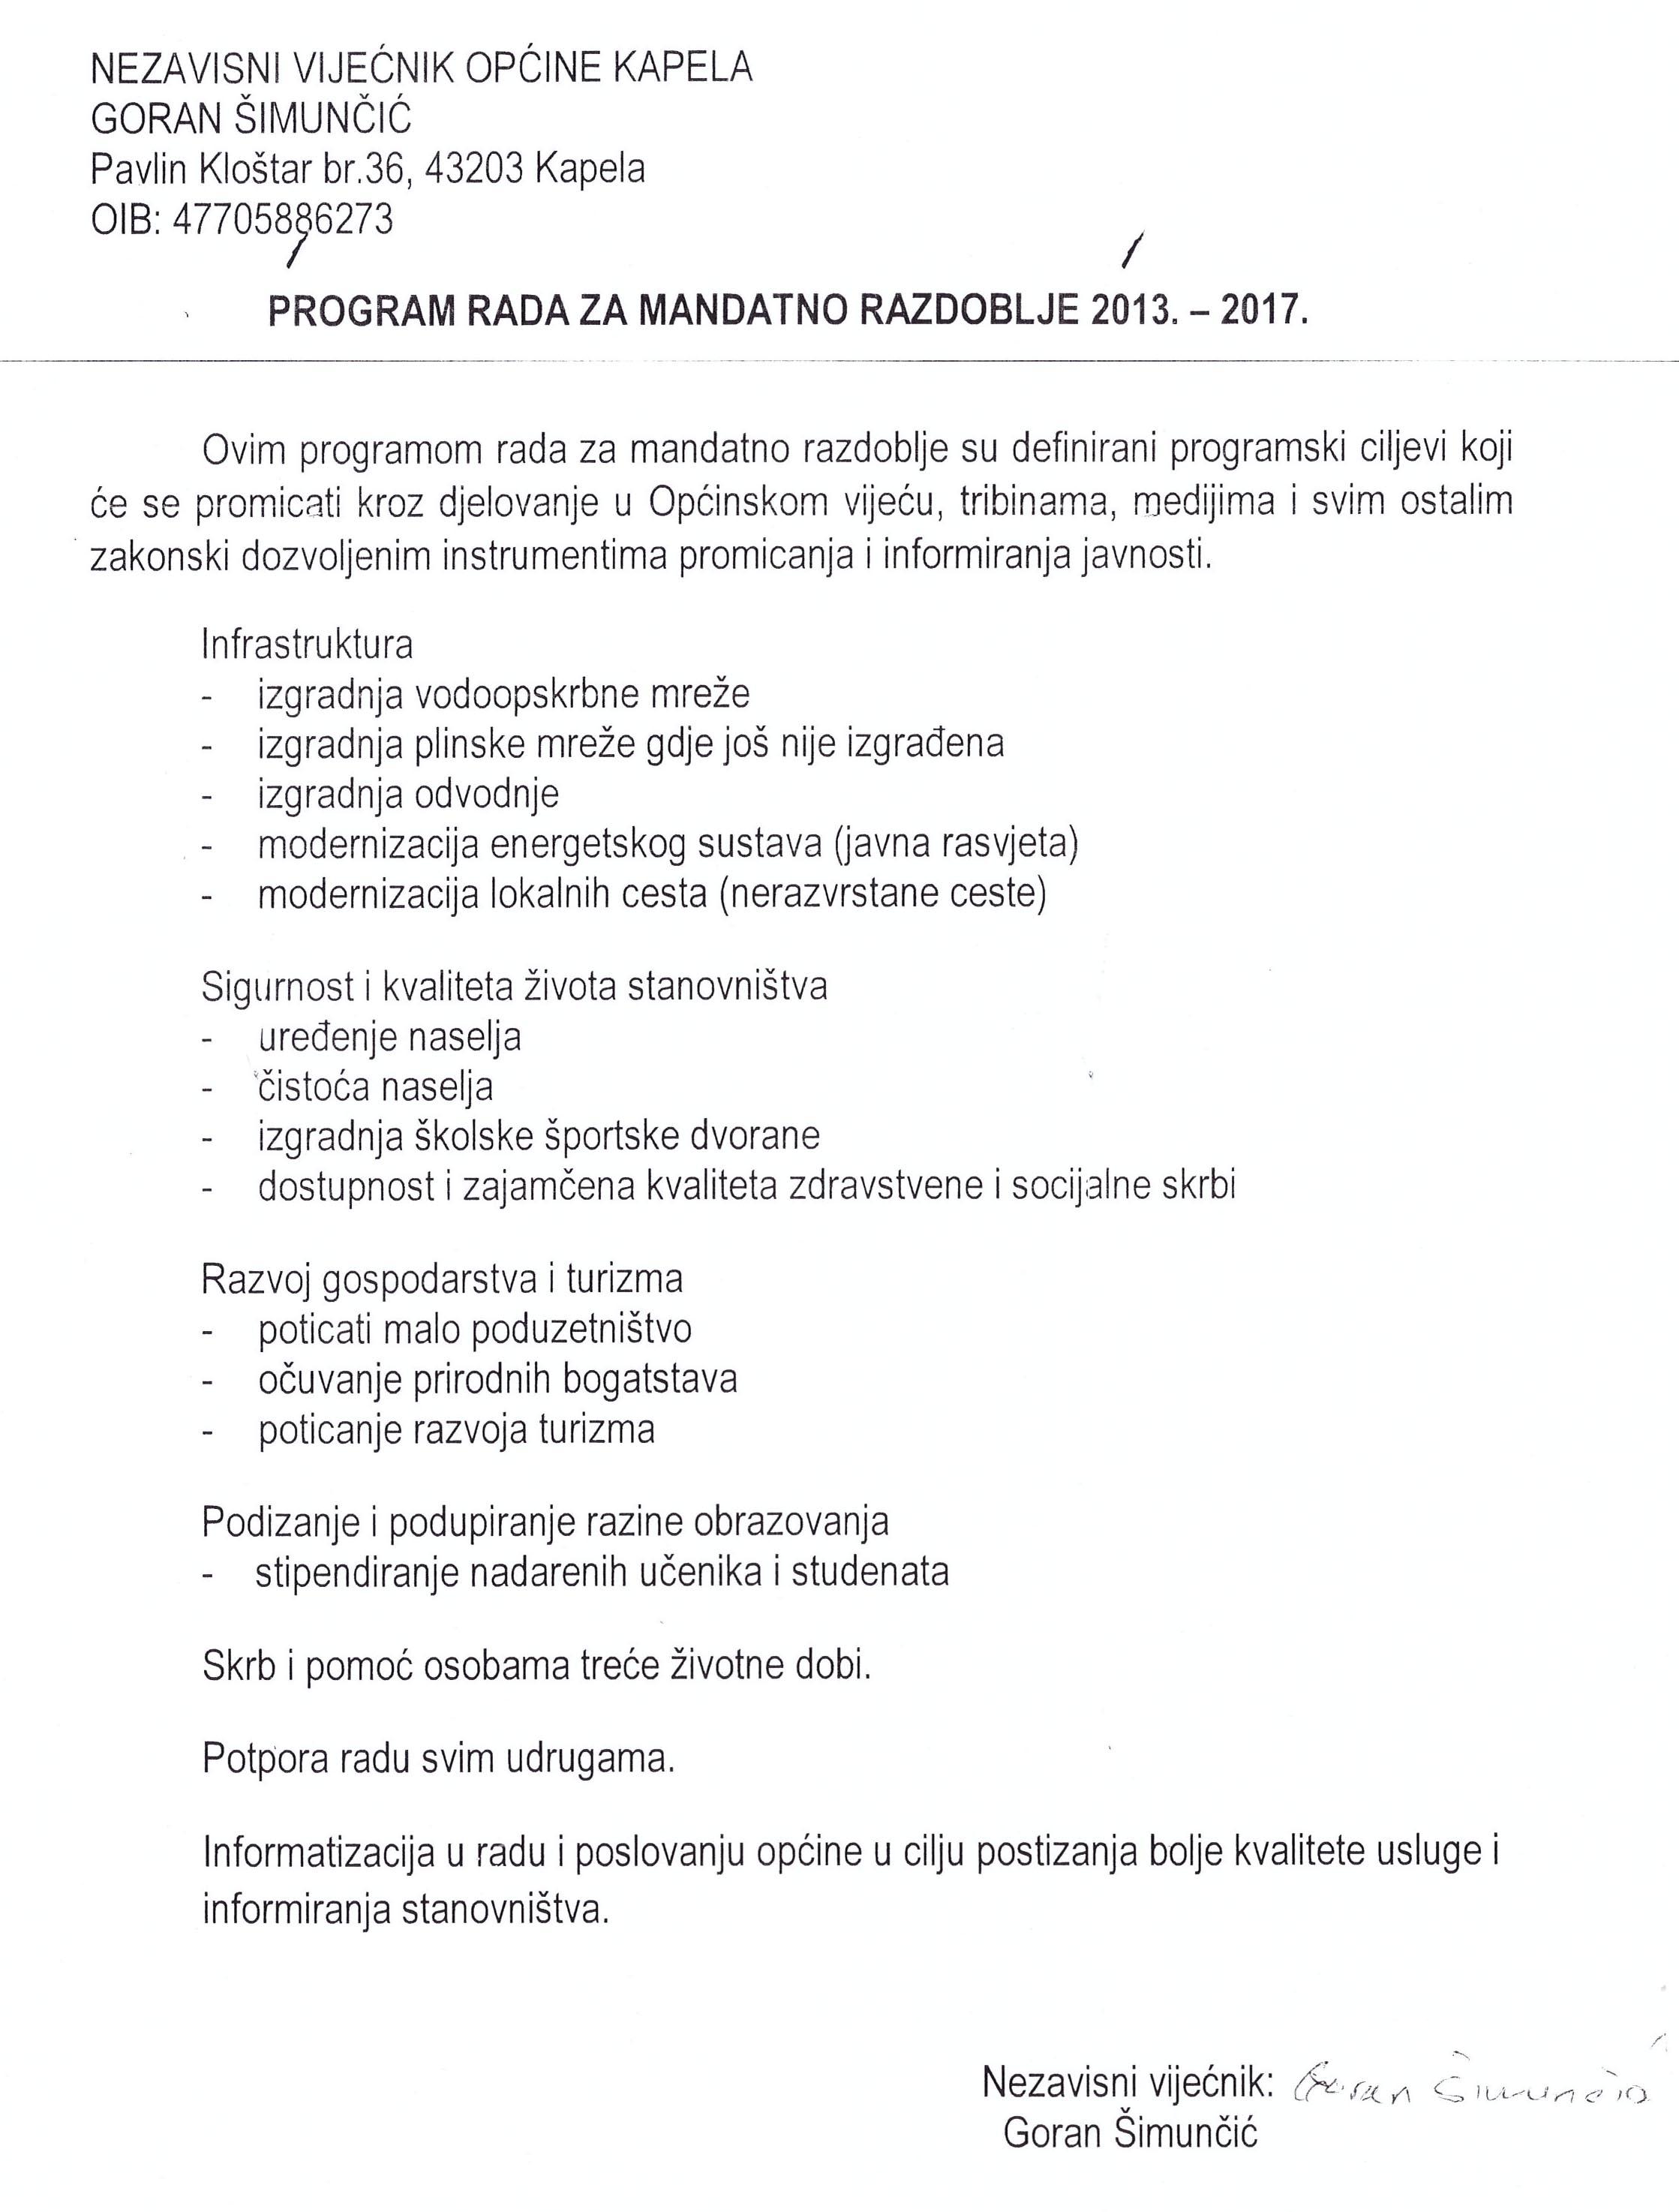 Program rada